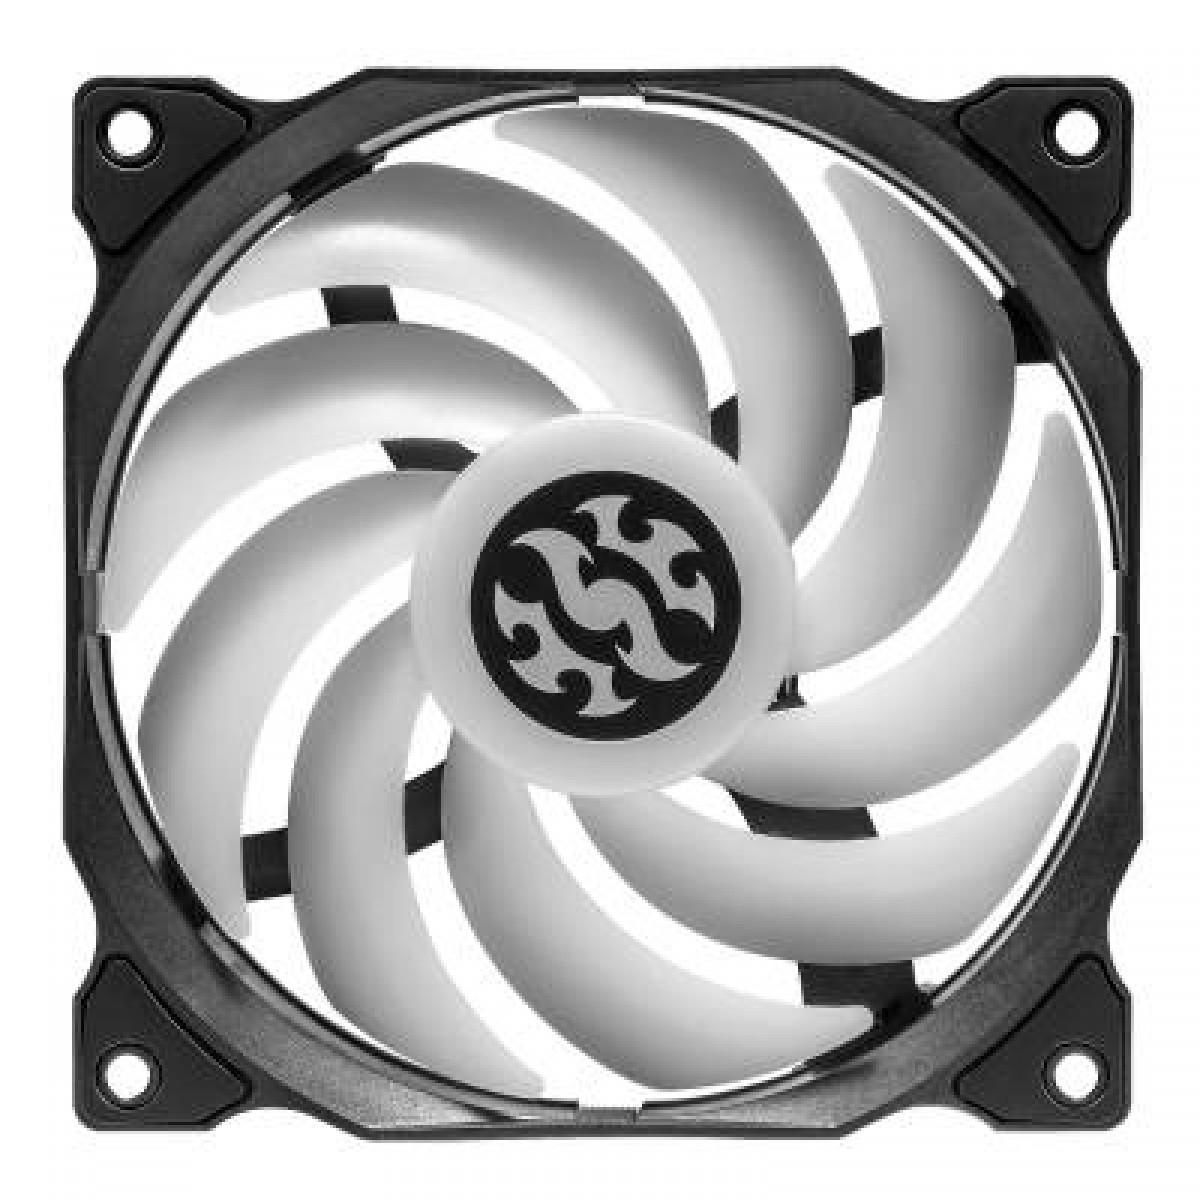 Cooler Para Gabinete XPG, Vento 120 ARGB, 120mm, ARGB, 75260103